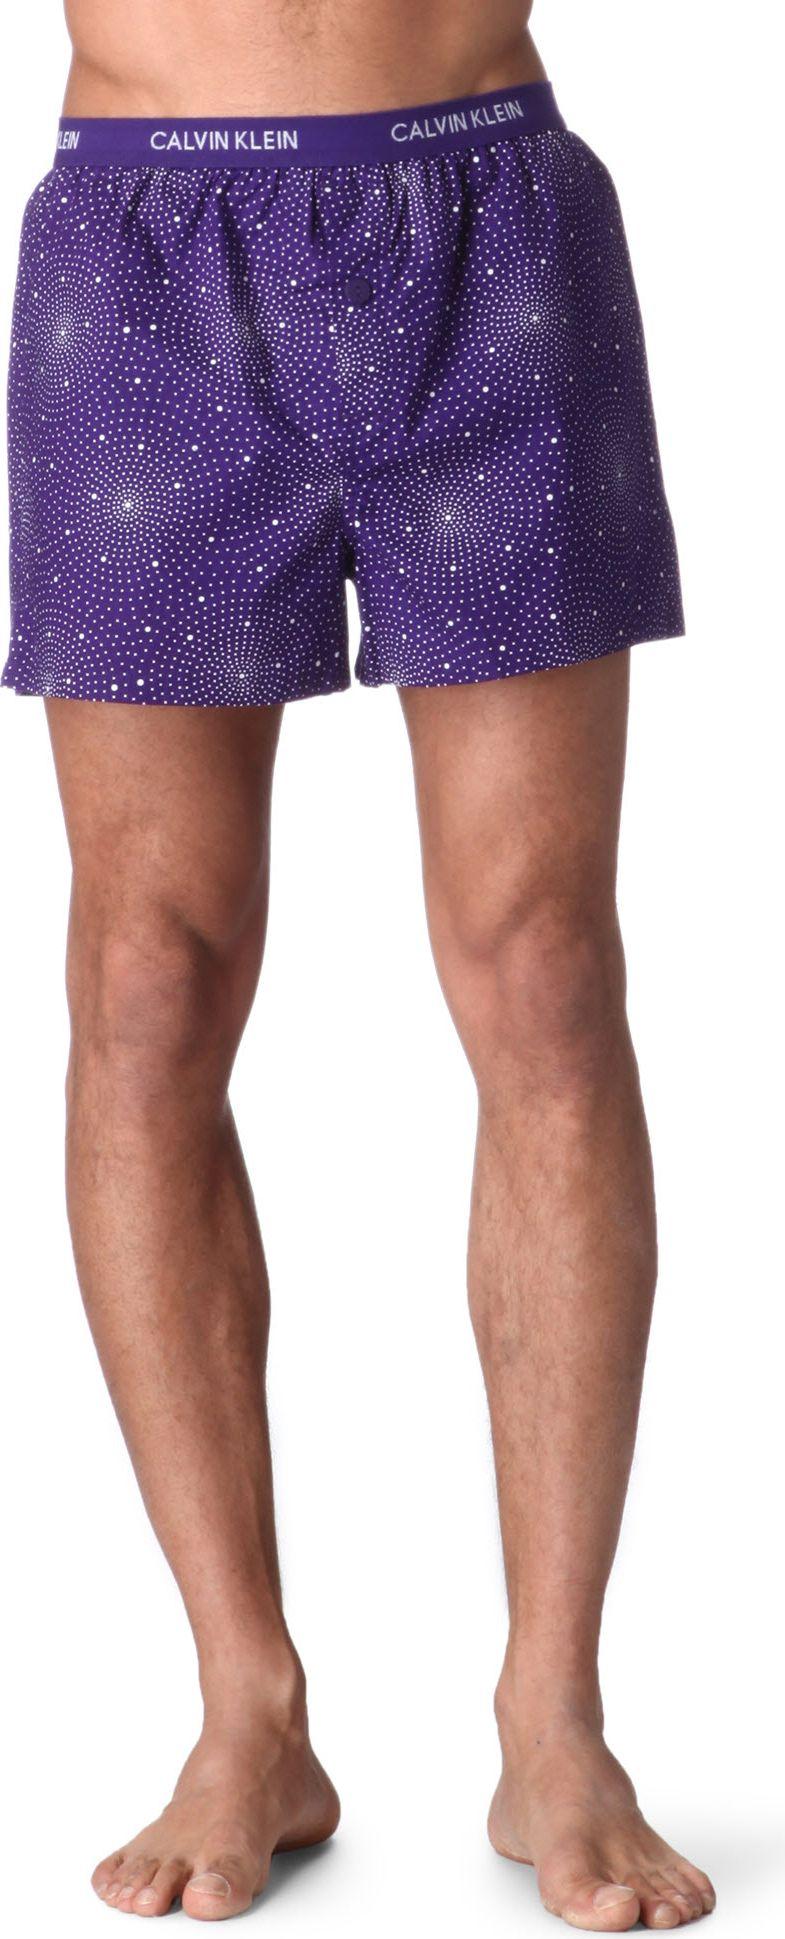 calvin klein woven slim fit boxer shorts in purple for men. Black Bedroom Furniture Sets. Home Design Ideas